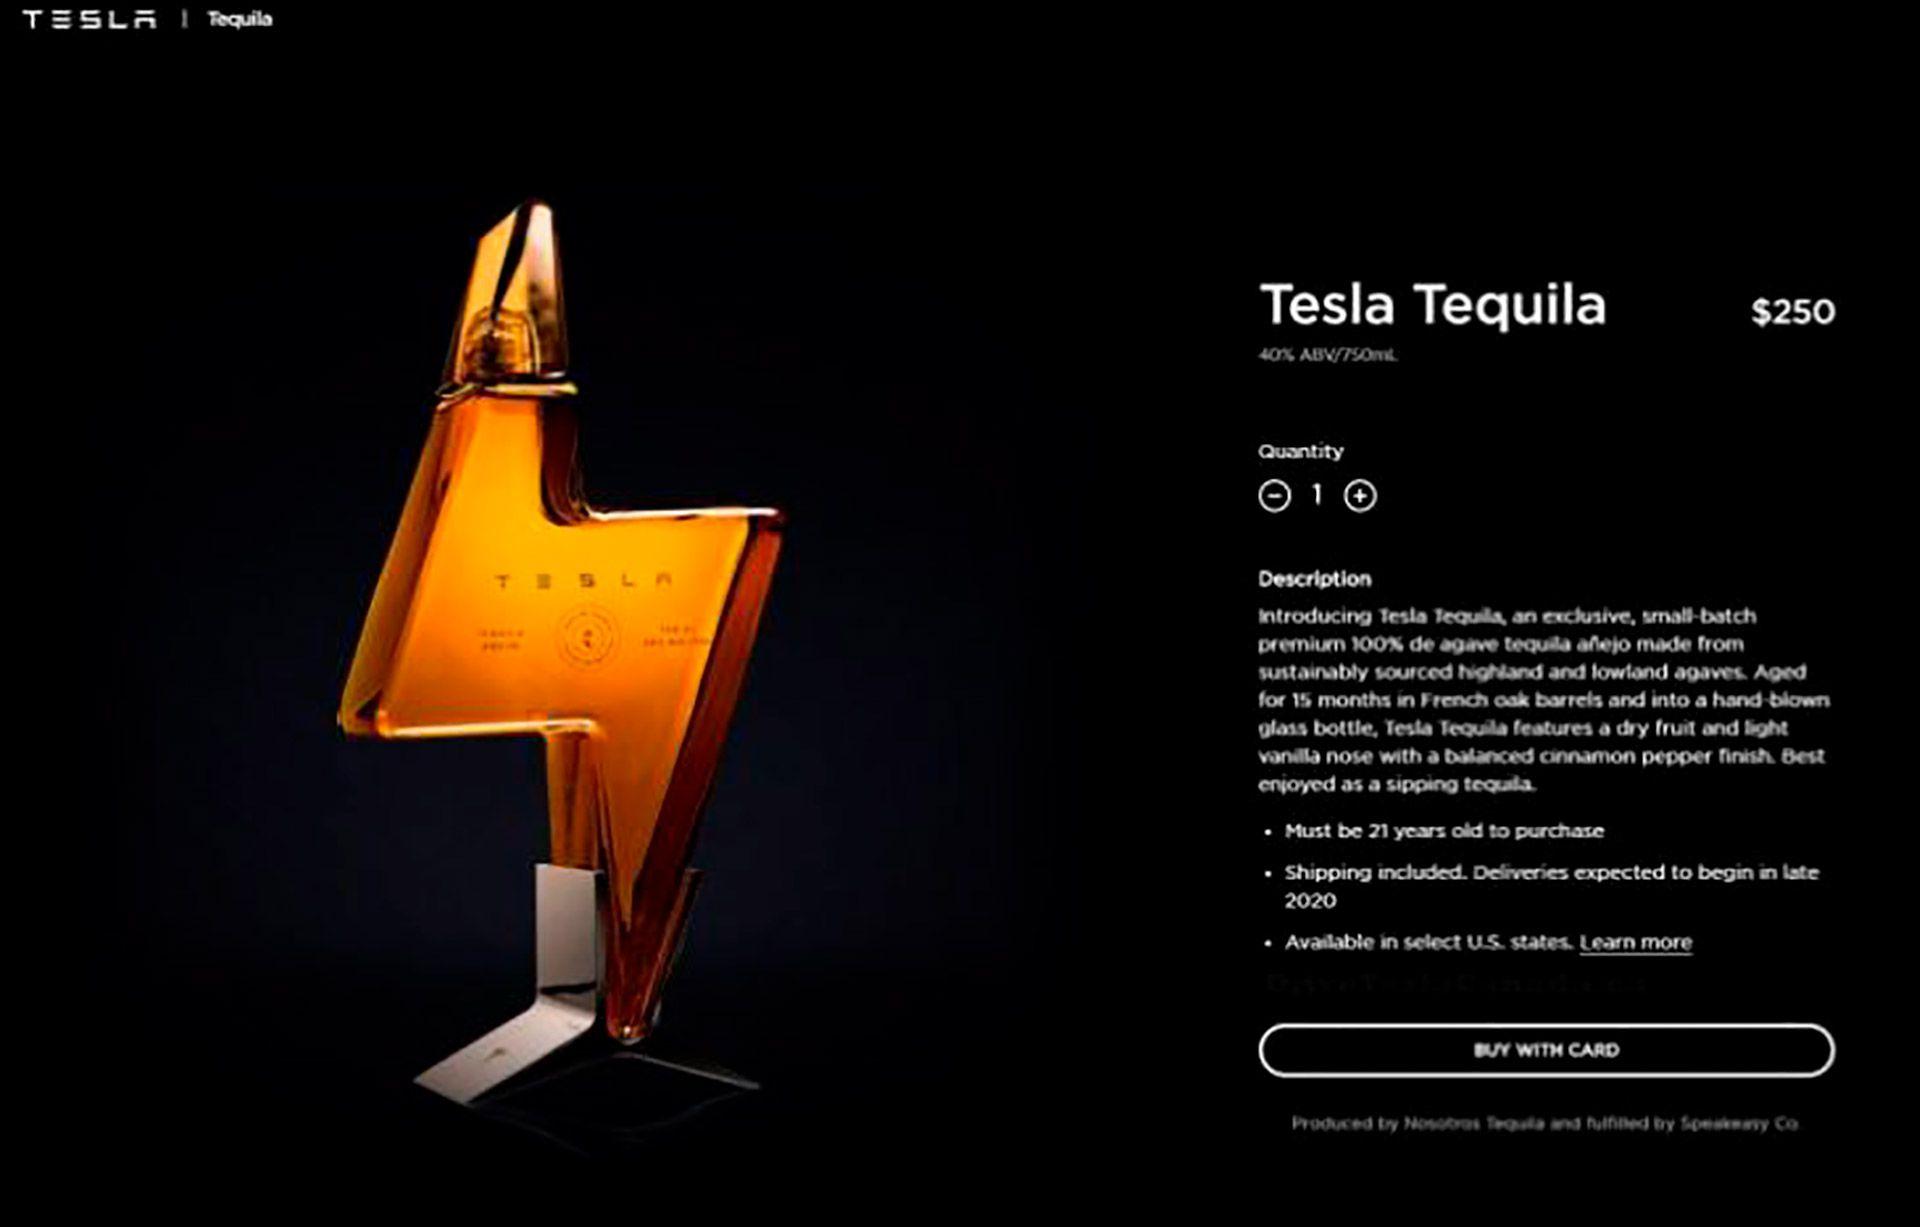 Tesla Tequila Elon Musk